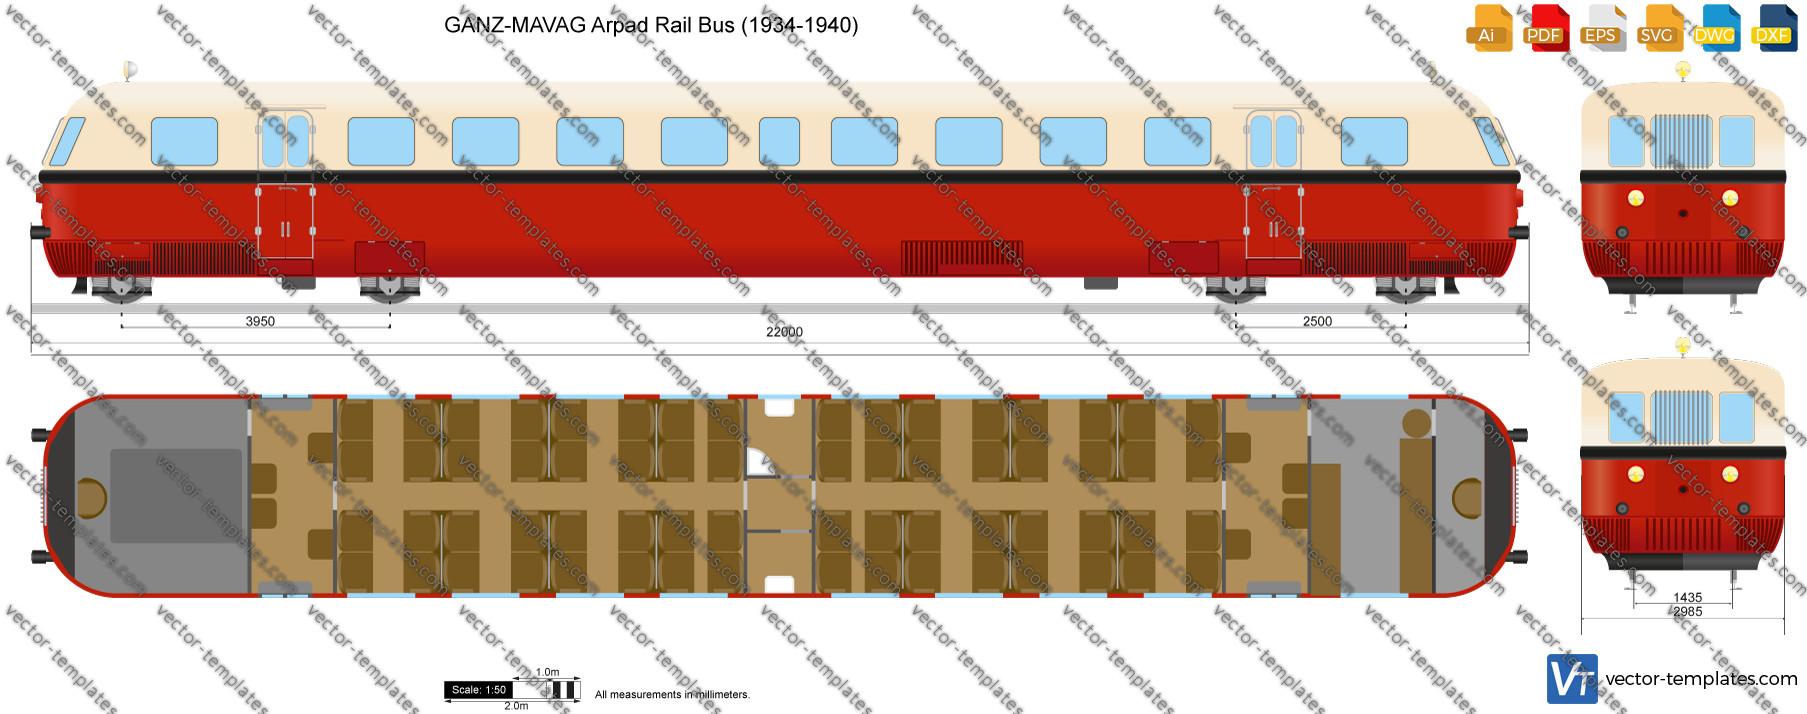 GANZ-MAVAG Arpad Rail Bus (1934-1940)